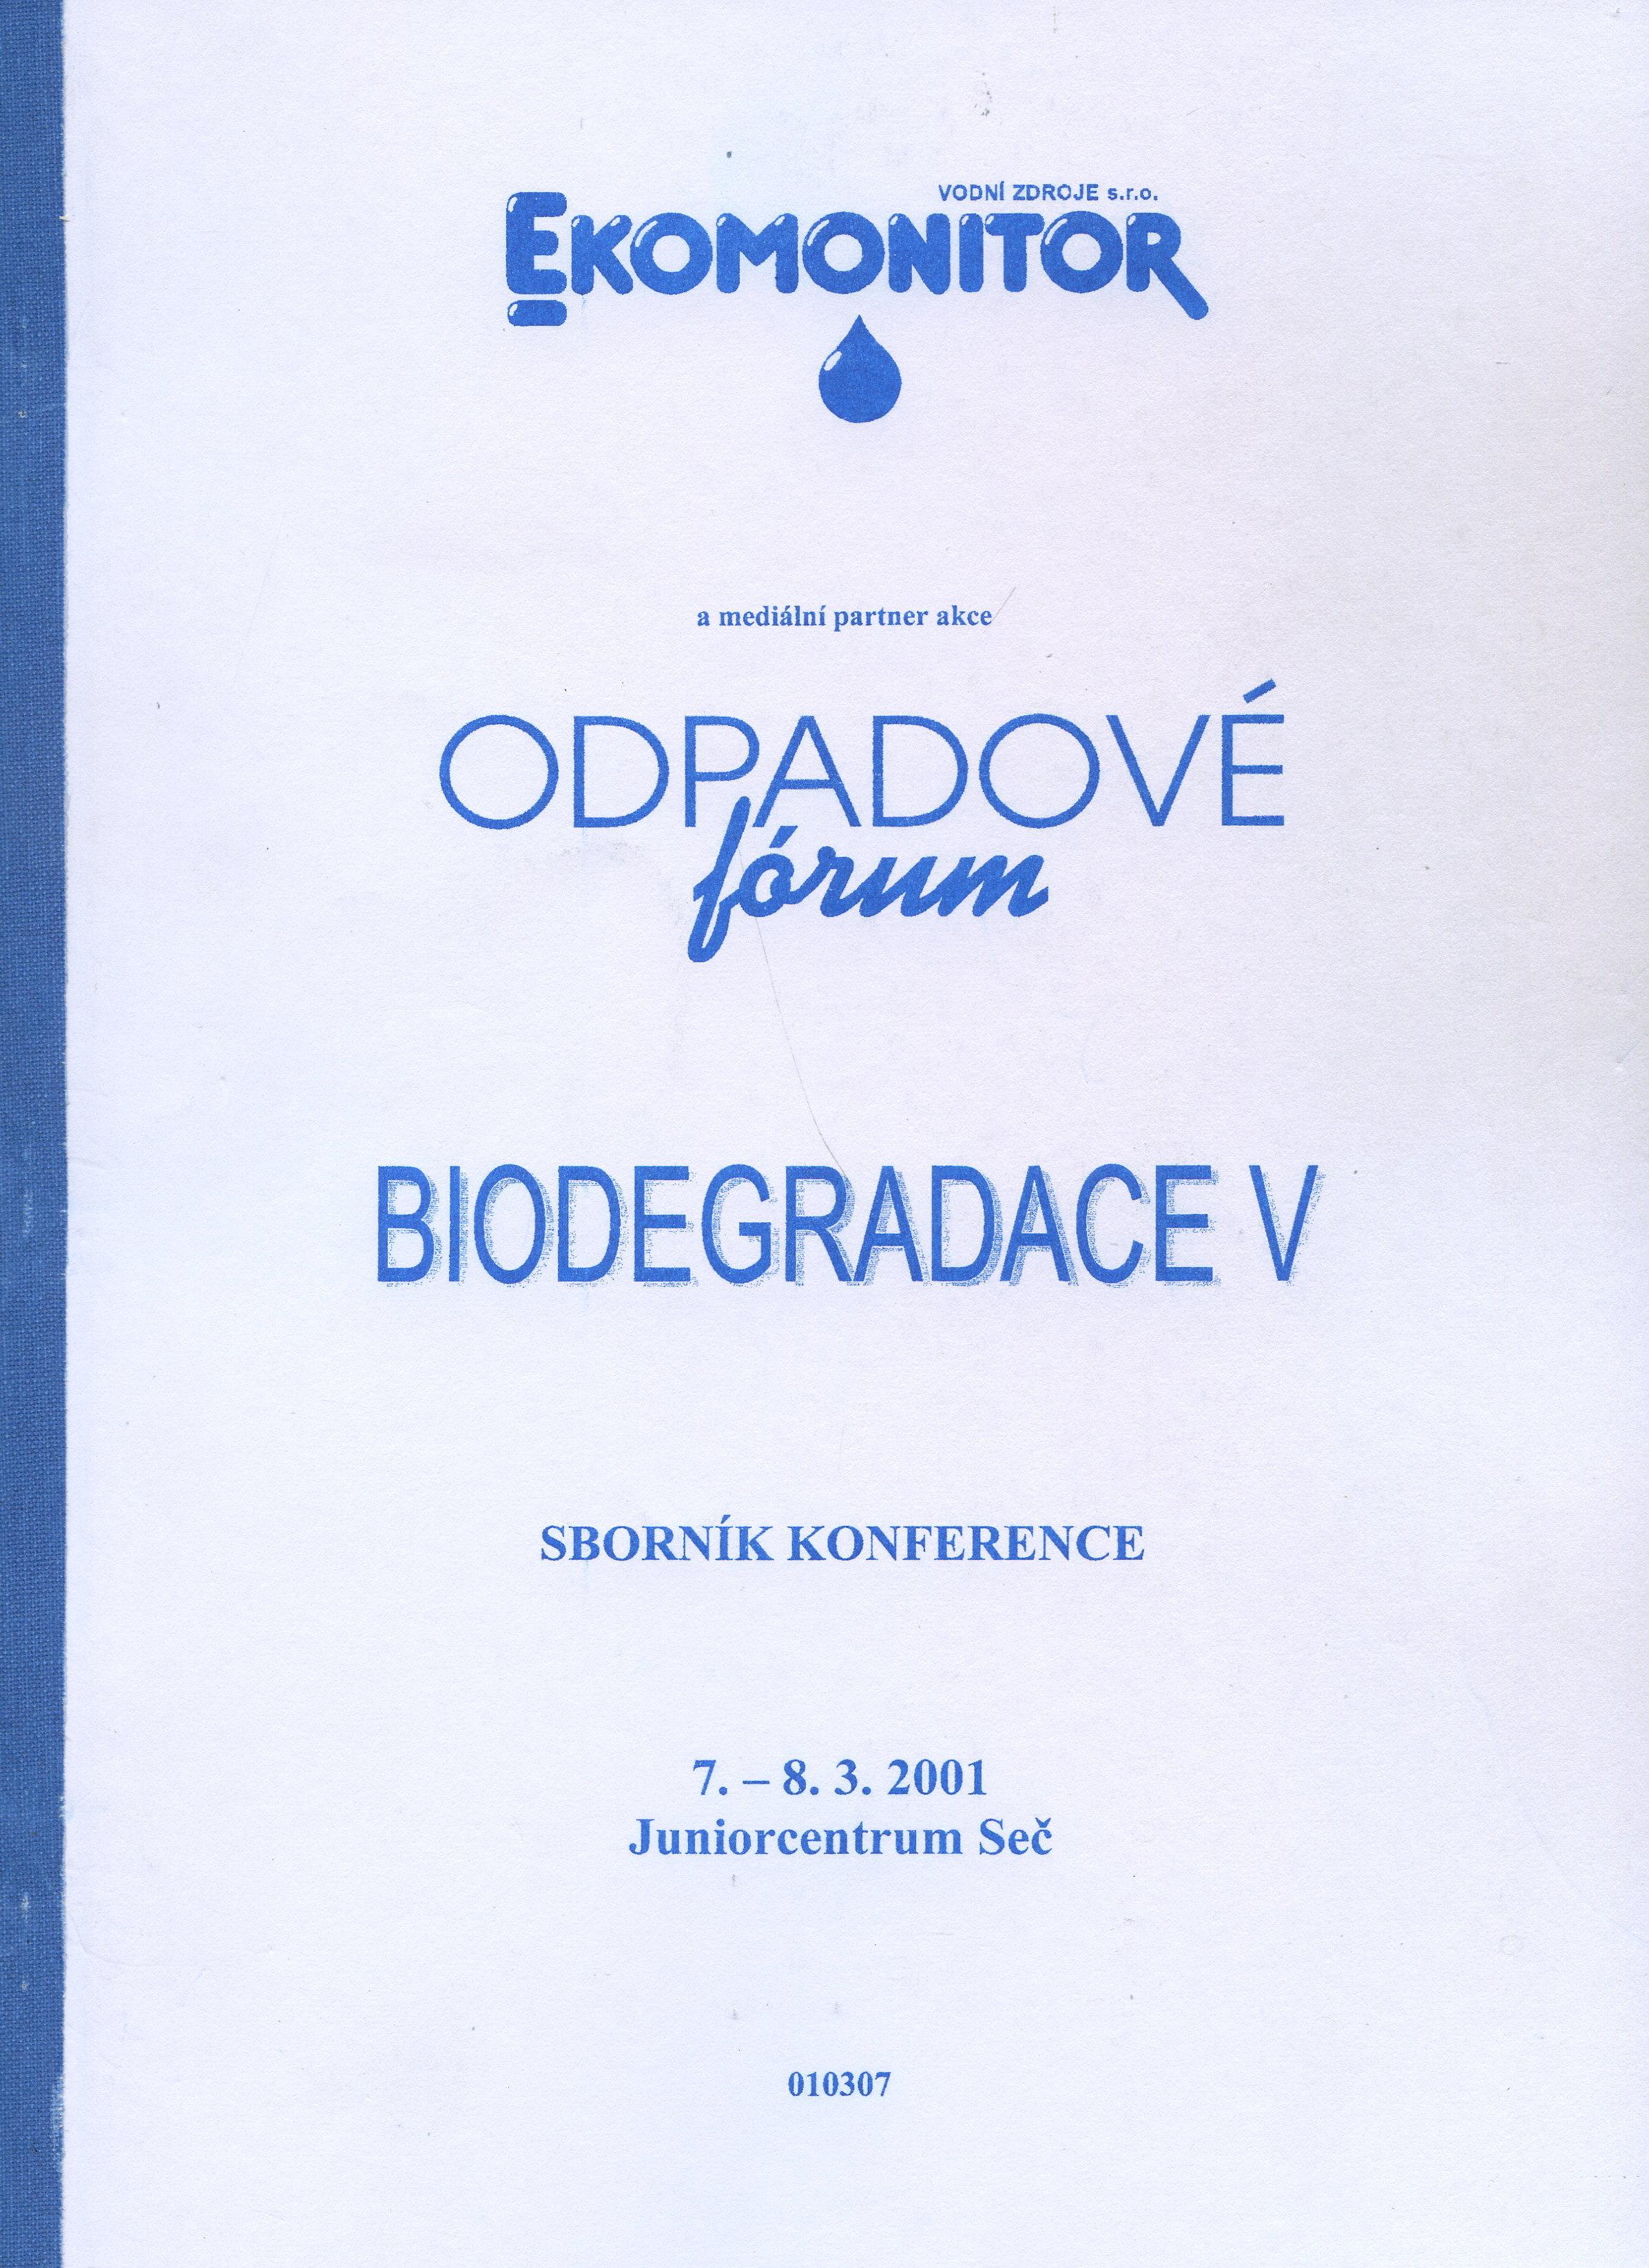 Biodegradace V